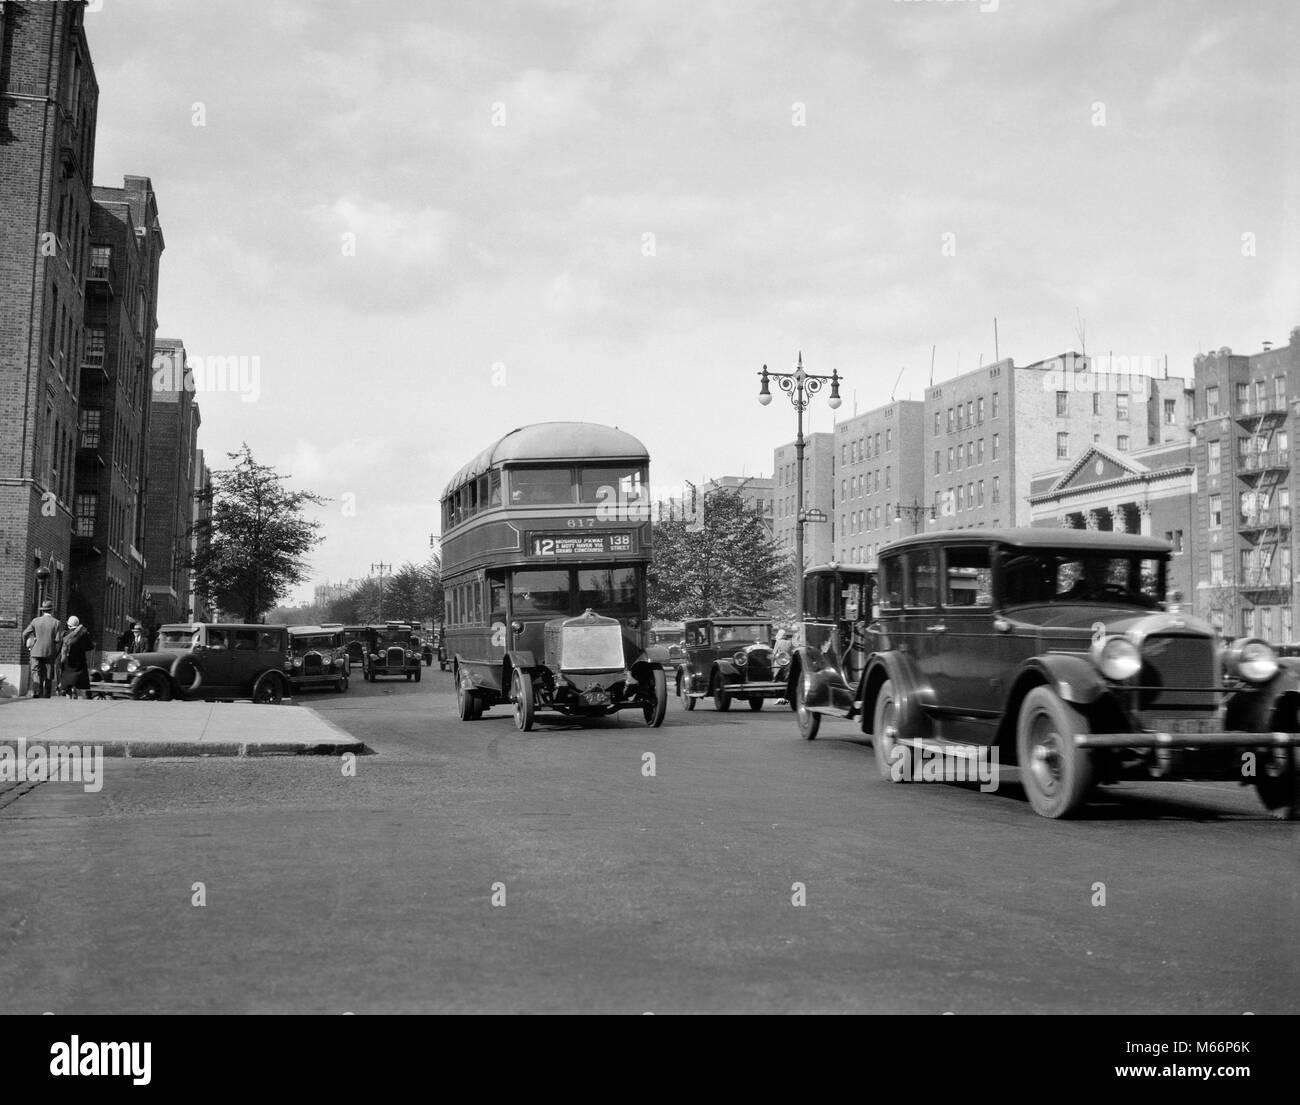 1920s New York City Stock Photos & 1920s New York City